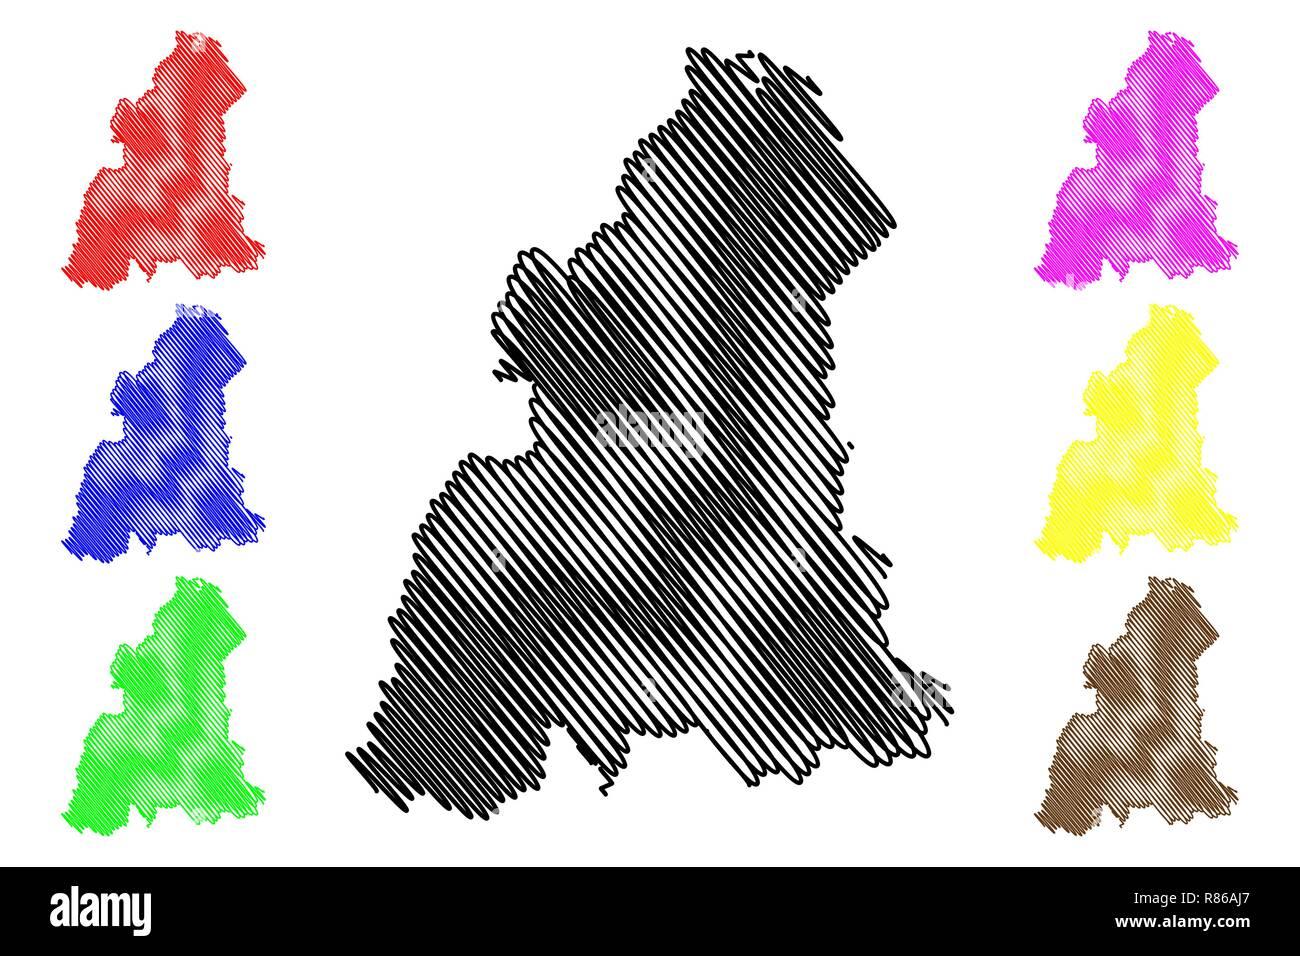 Kelantan (States and federal territories of Malaysia, Federation of Malaysia) map vector illustration, scribble sketch Kelantan Darul Naim map - Stock Vector